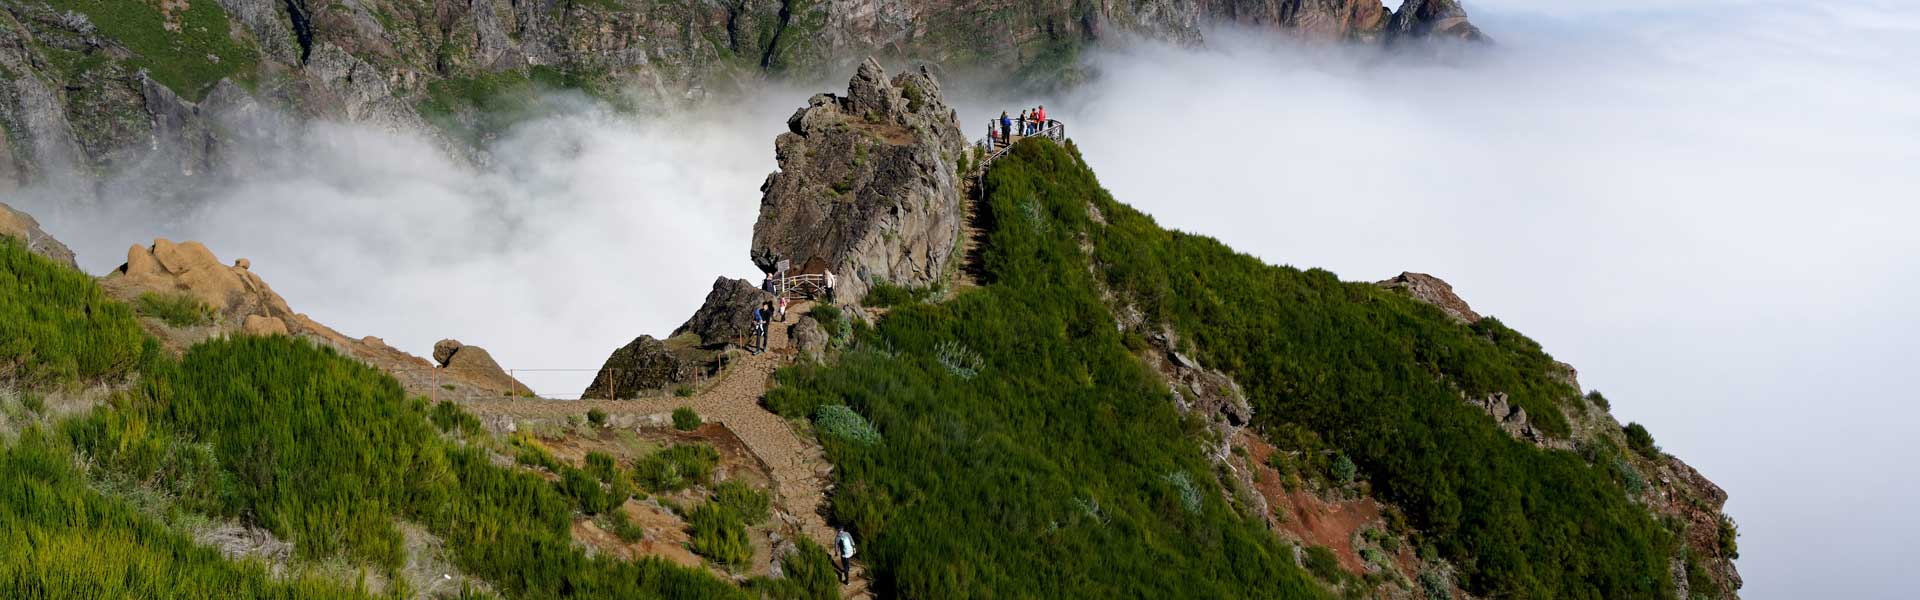 Vandreferie på Madeira